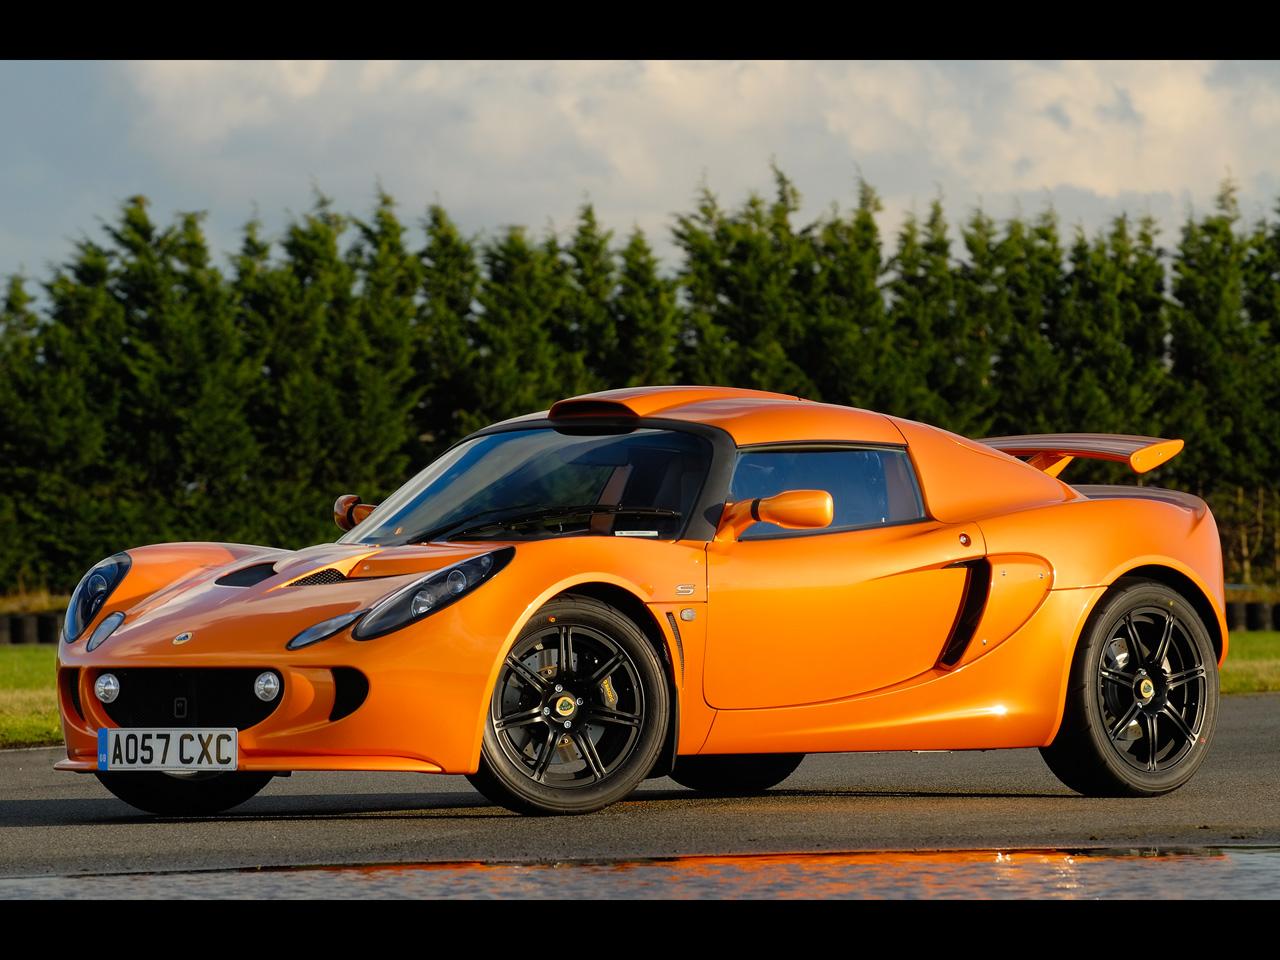 Famous Lotus Car 13 Free Hd Wallpaper